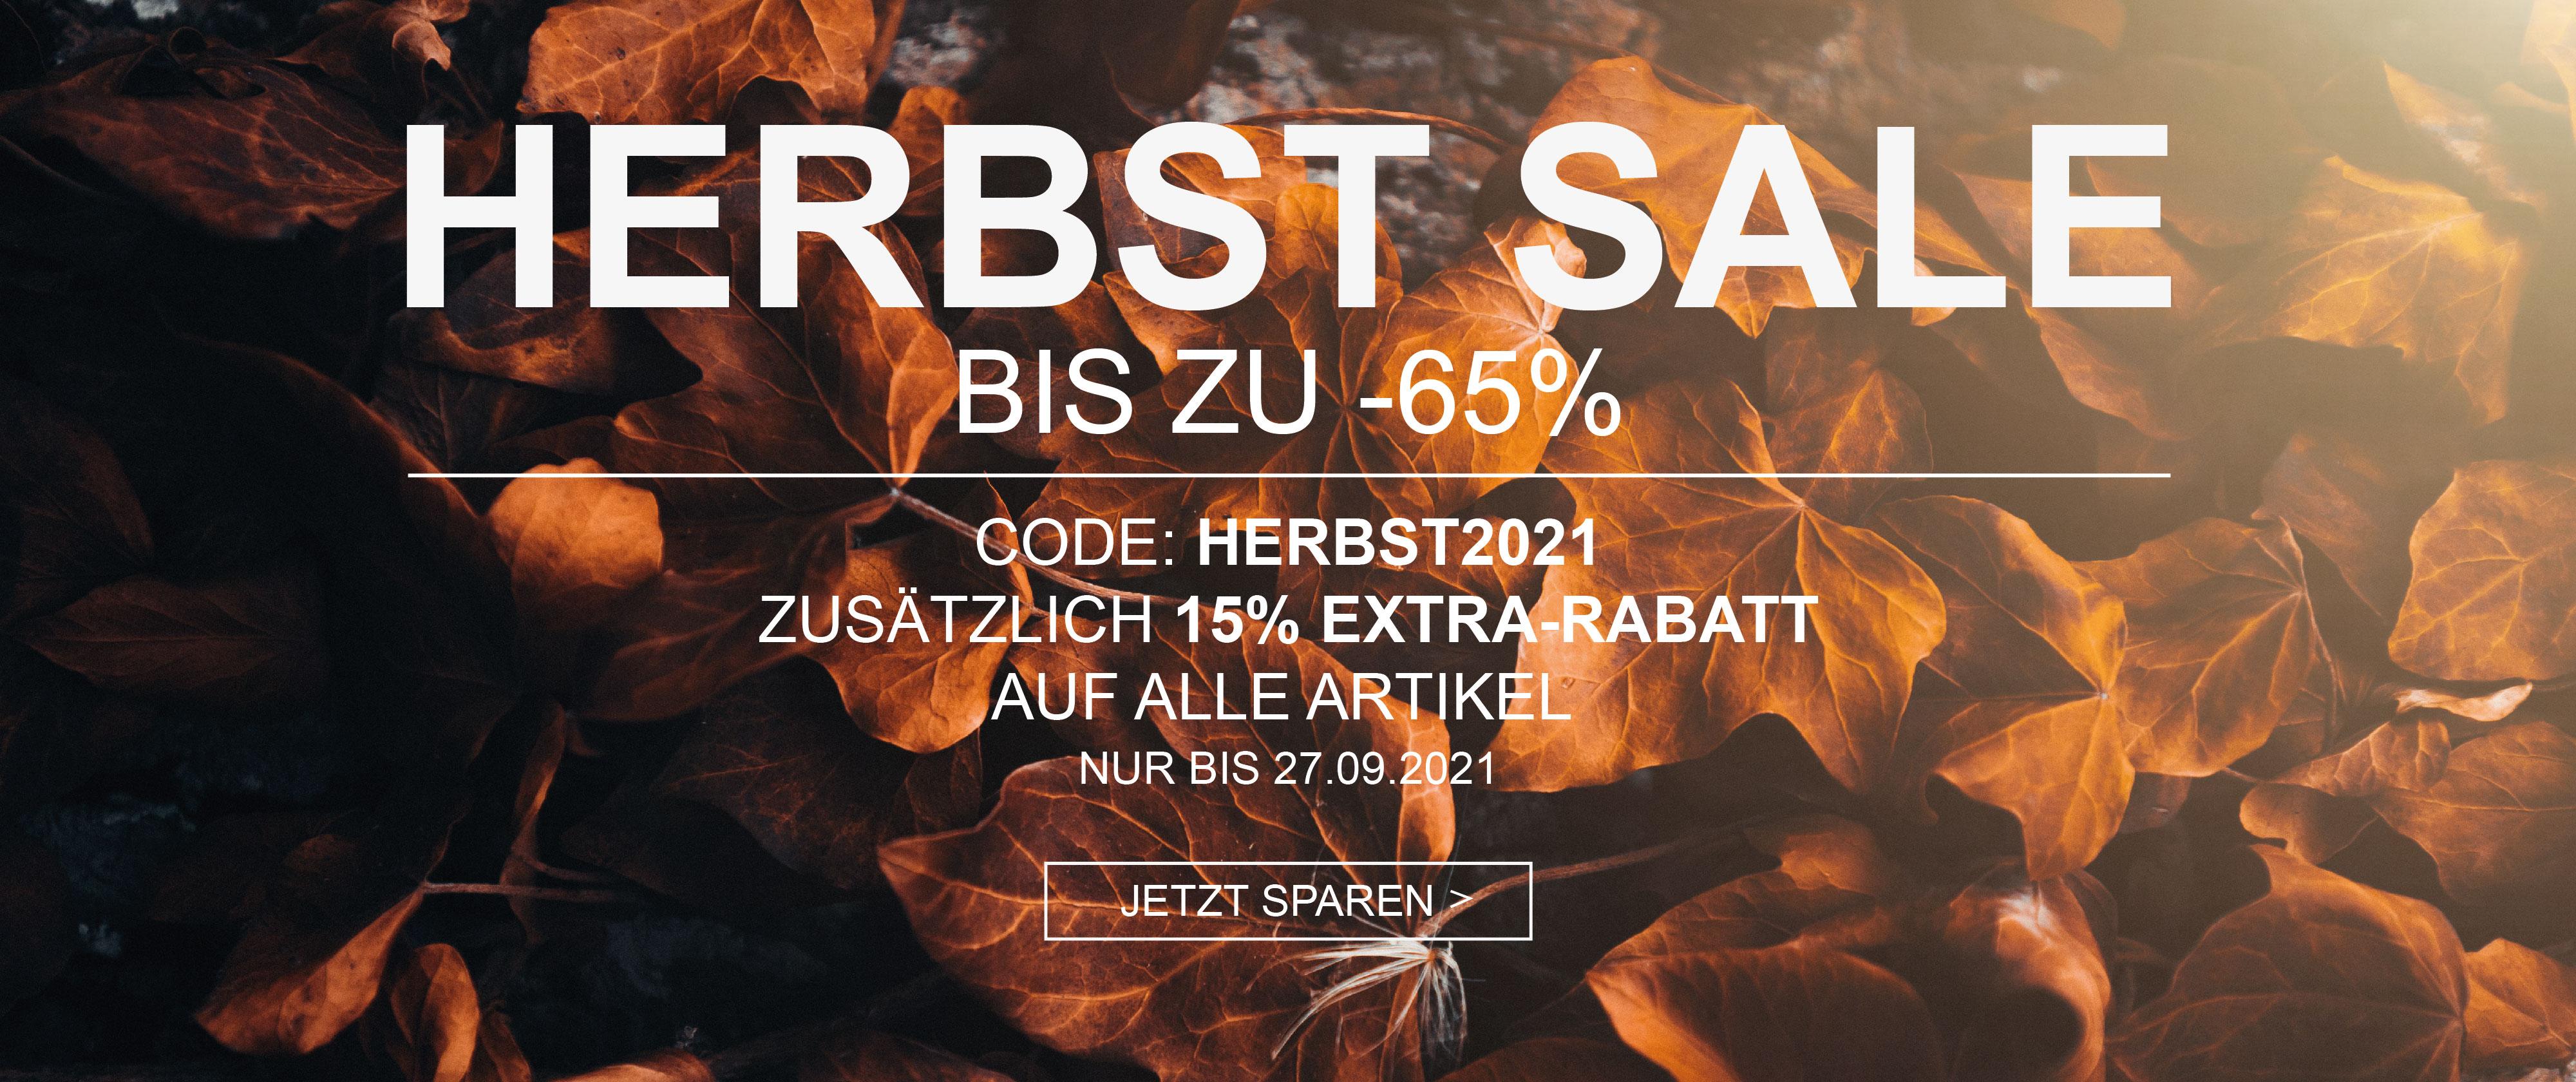 Herbst-Sale-mobile_Zeichenfl-che-1UvbFnwi31mWma